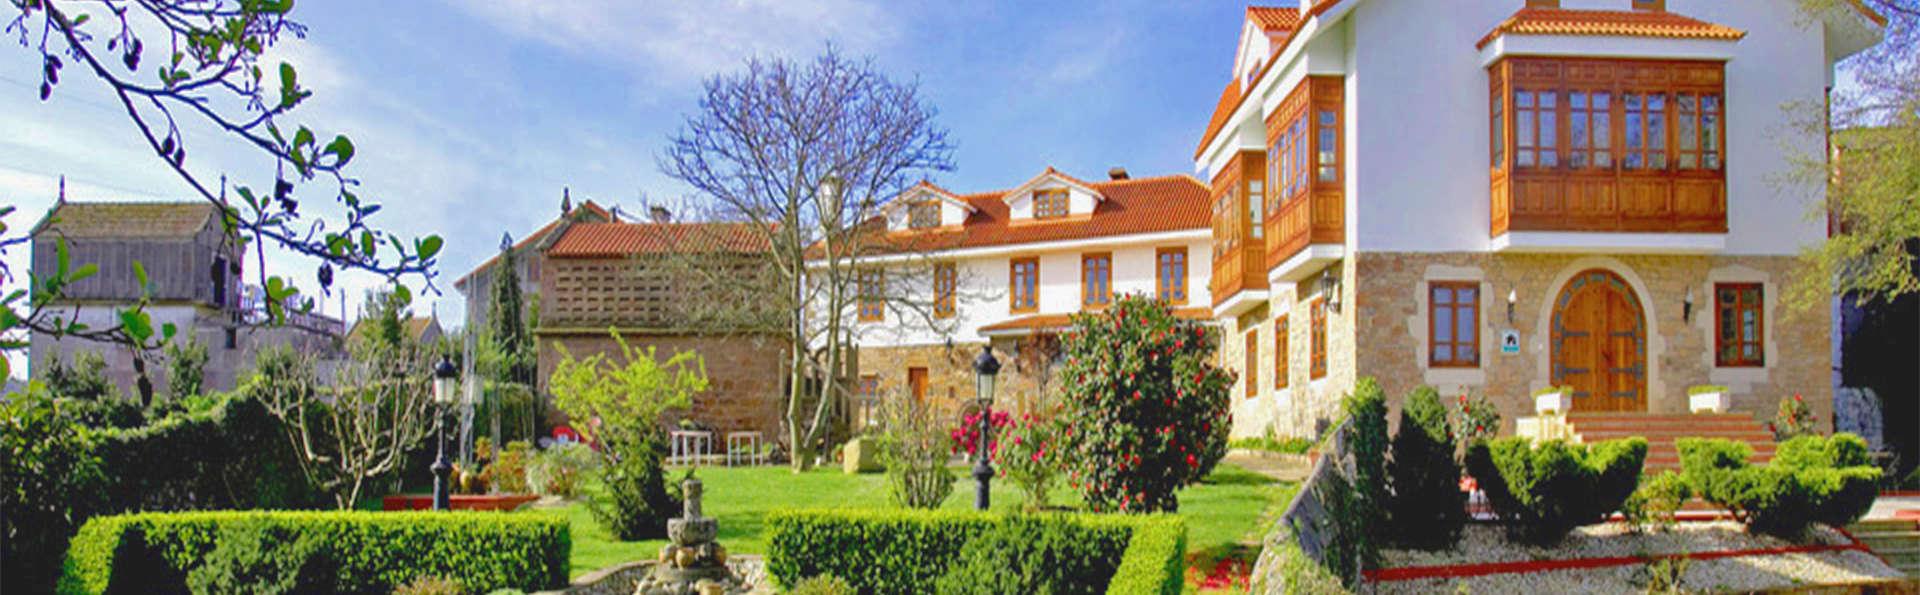 Hotel Rural Mar de Queo 2 - EDIT_1_fachada.jpg